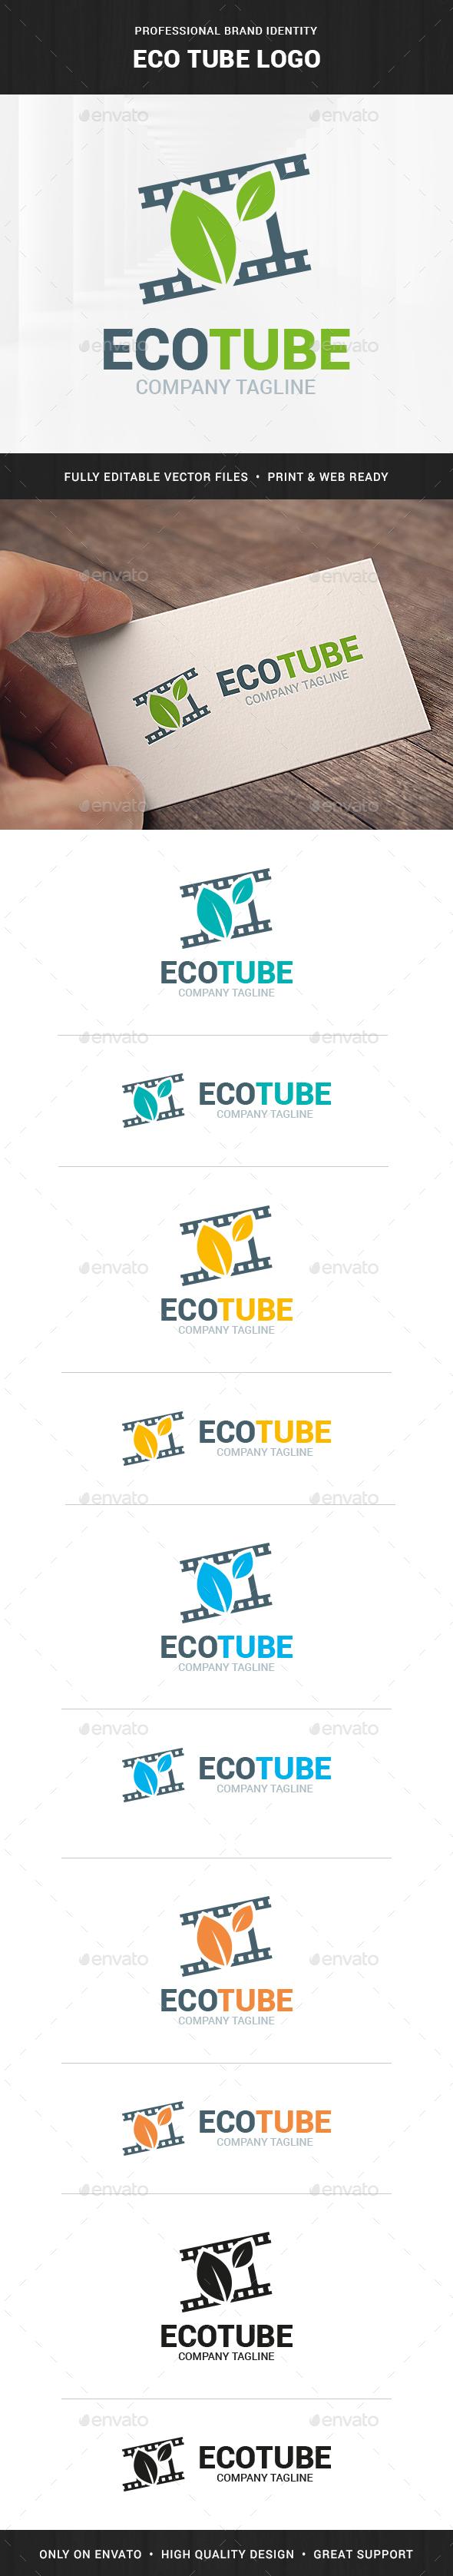 Eco Tube Logo Template